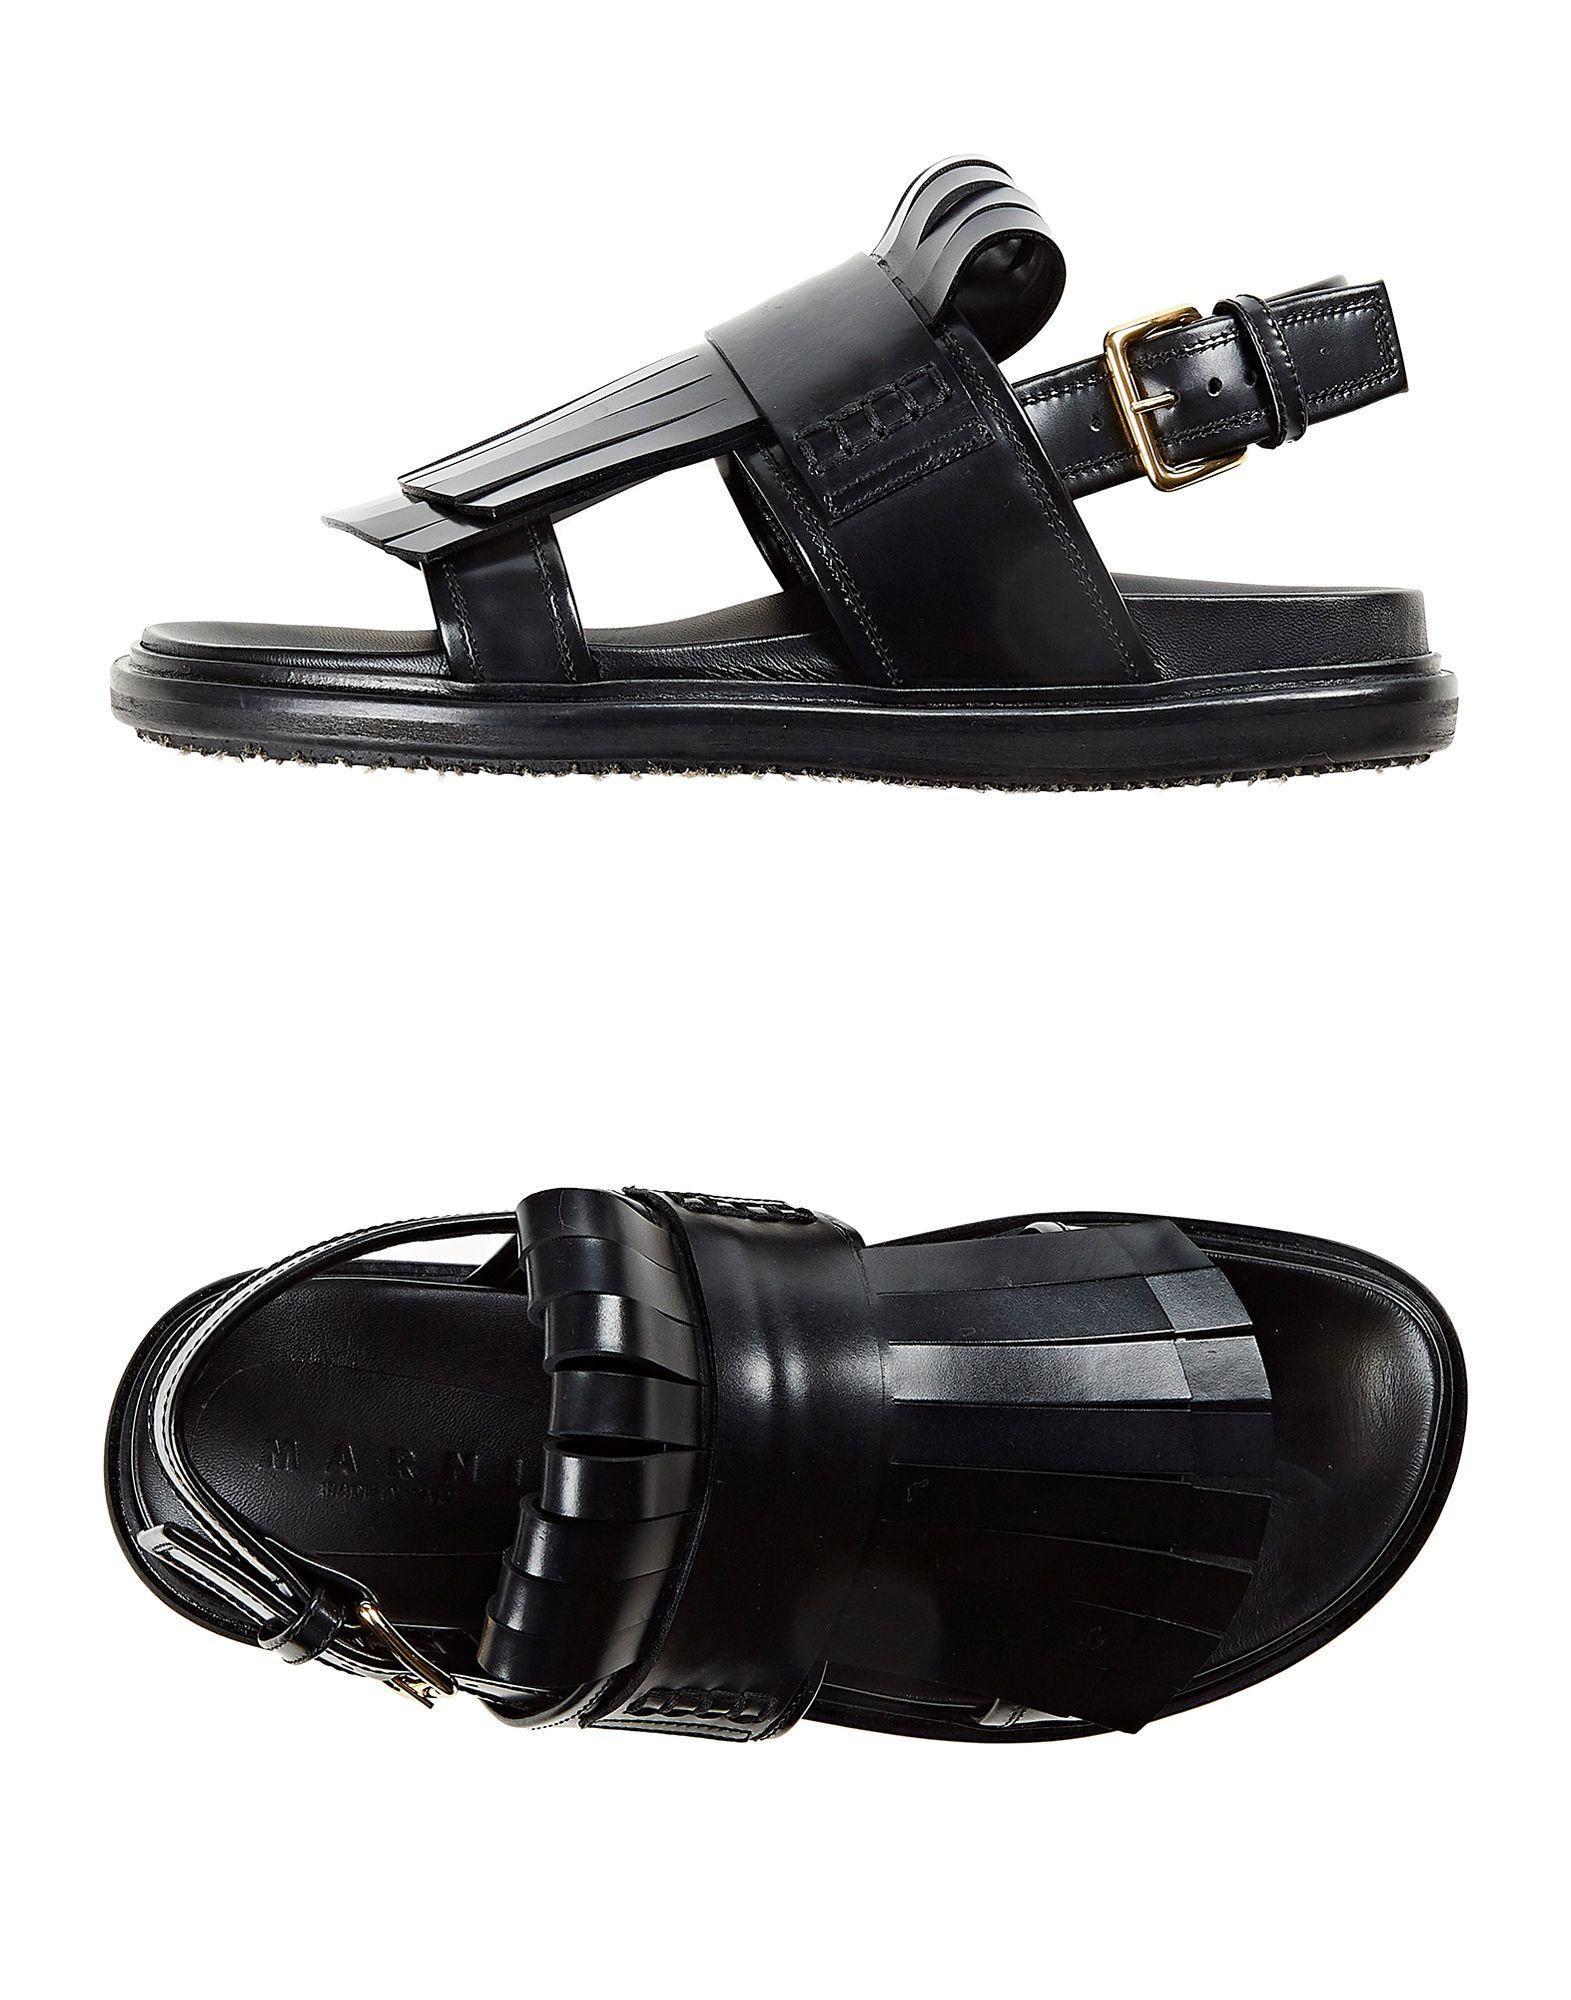 a3a25280cf0d Lyst - Marni Sandals in Black